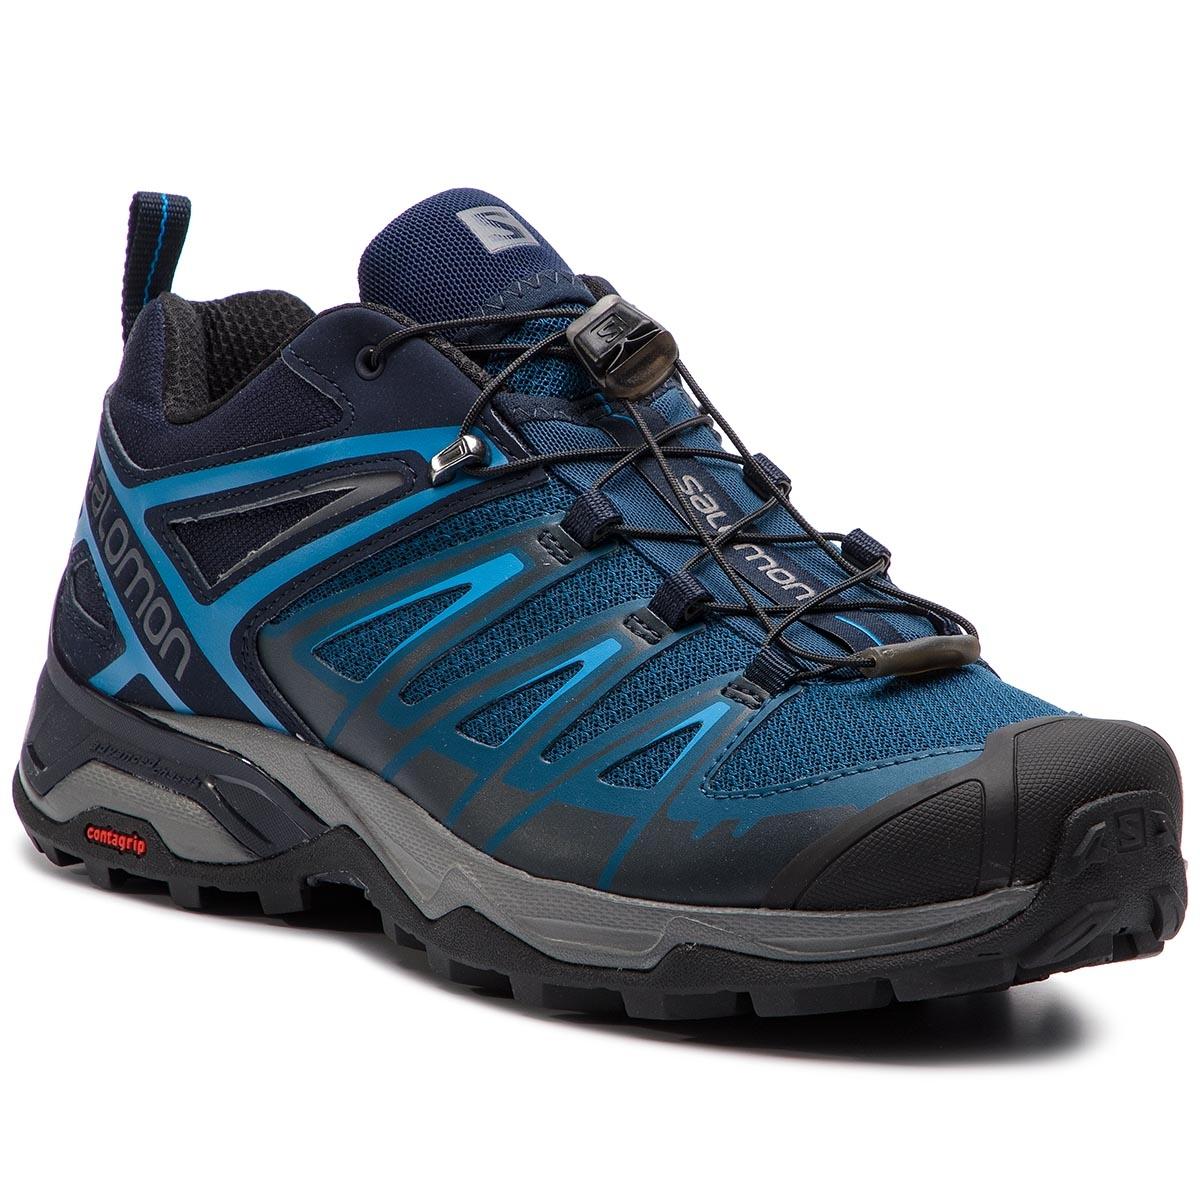 Trekker Boots SALOMON X Ultra 3 Prime Gtx W GORE TEX